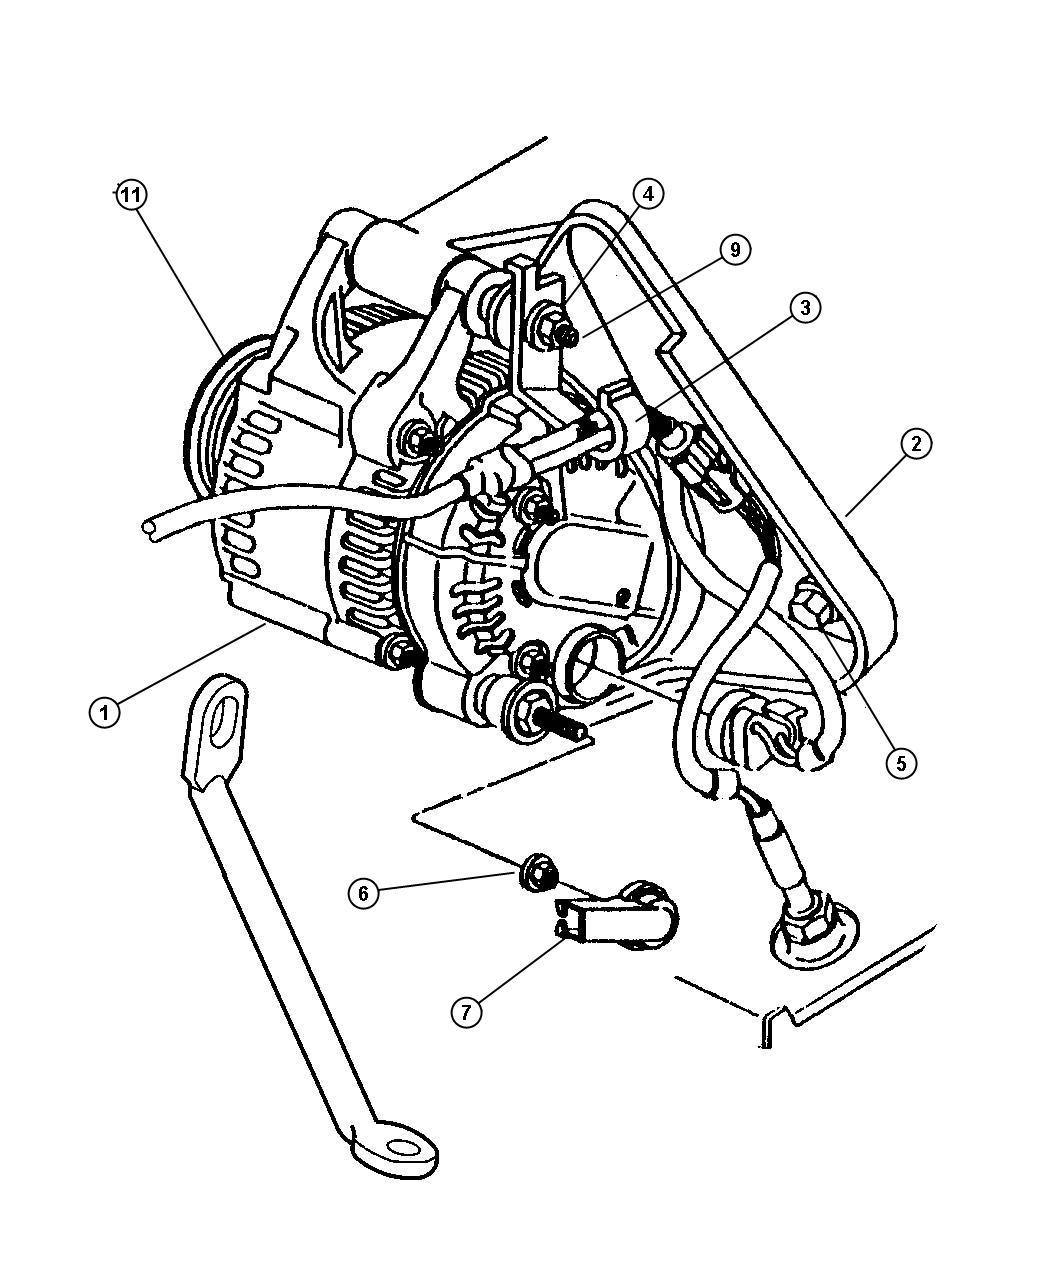 Dodge Intrepid Clip  Wiring  Transmission Wiring